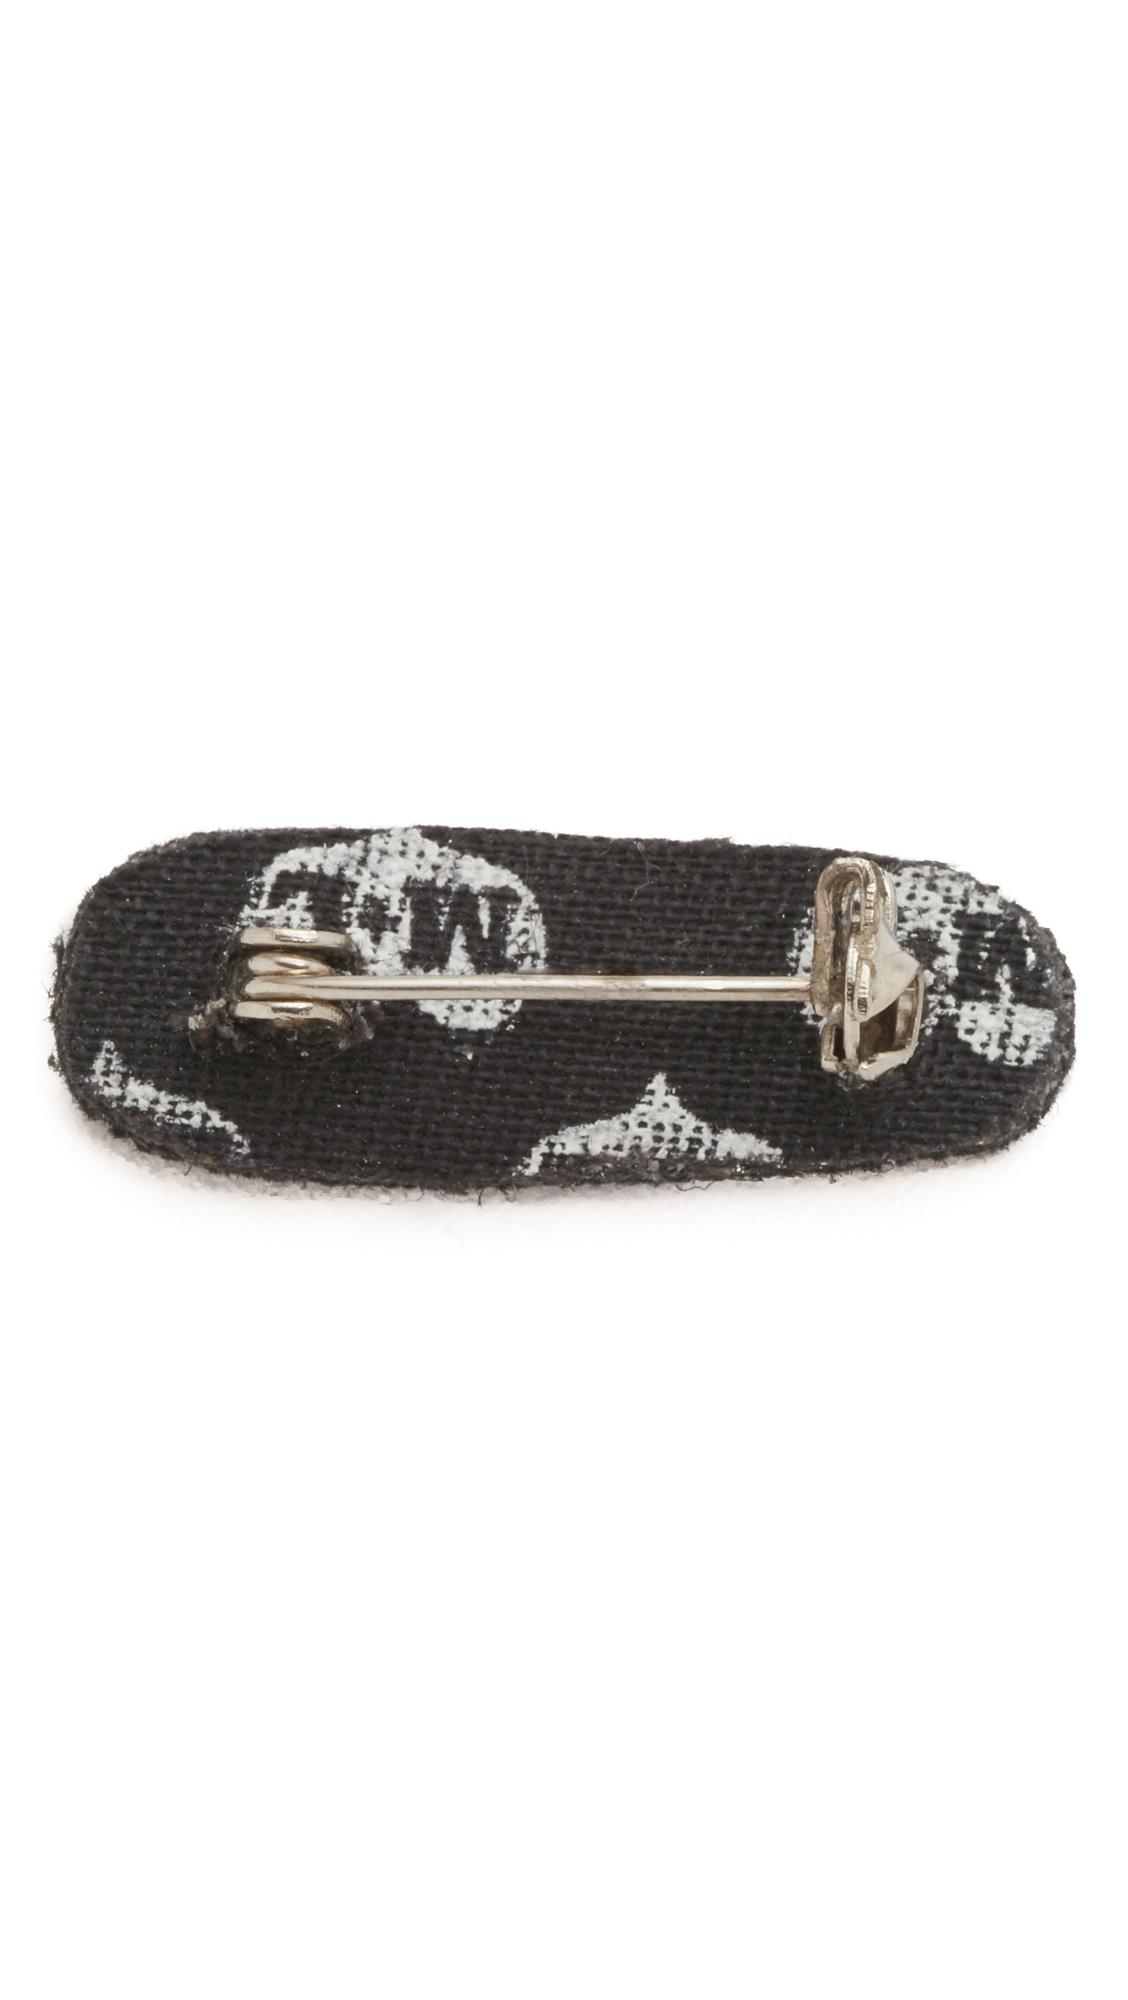 Macon & Lesquoy Safety Pin - Gold v7seig